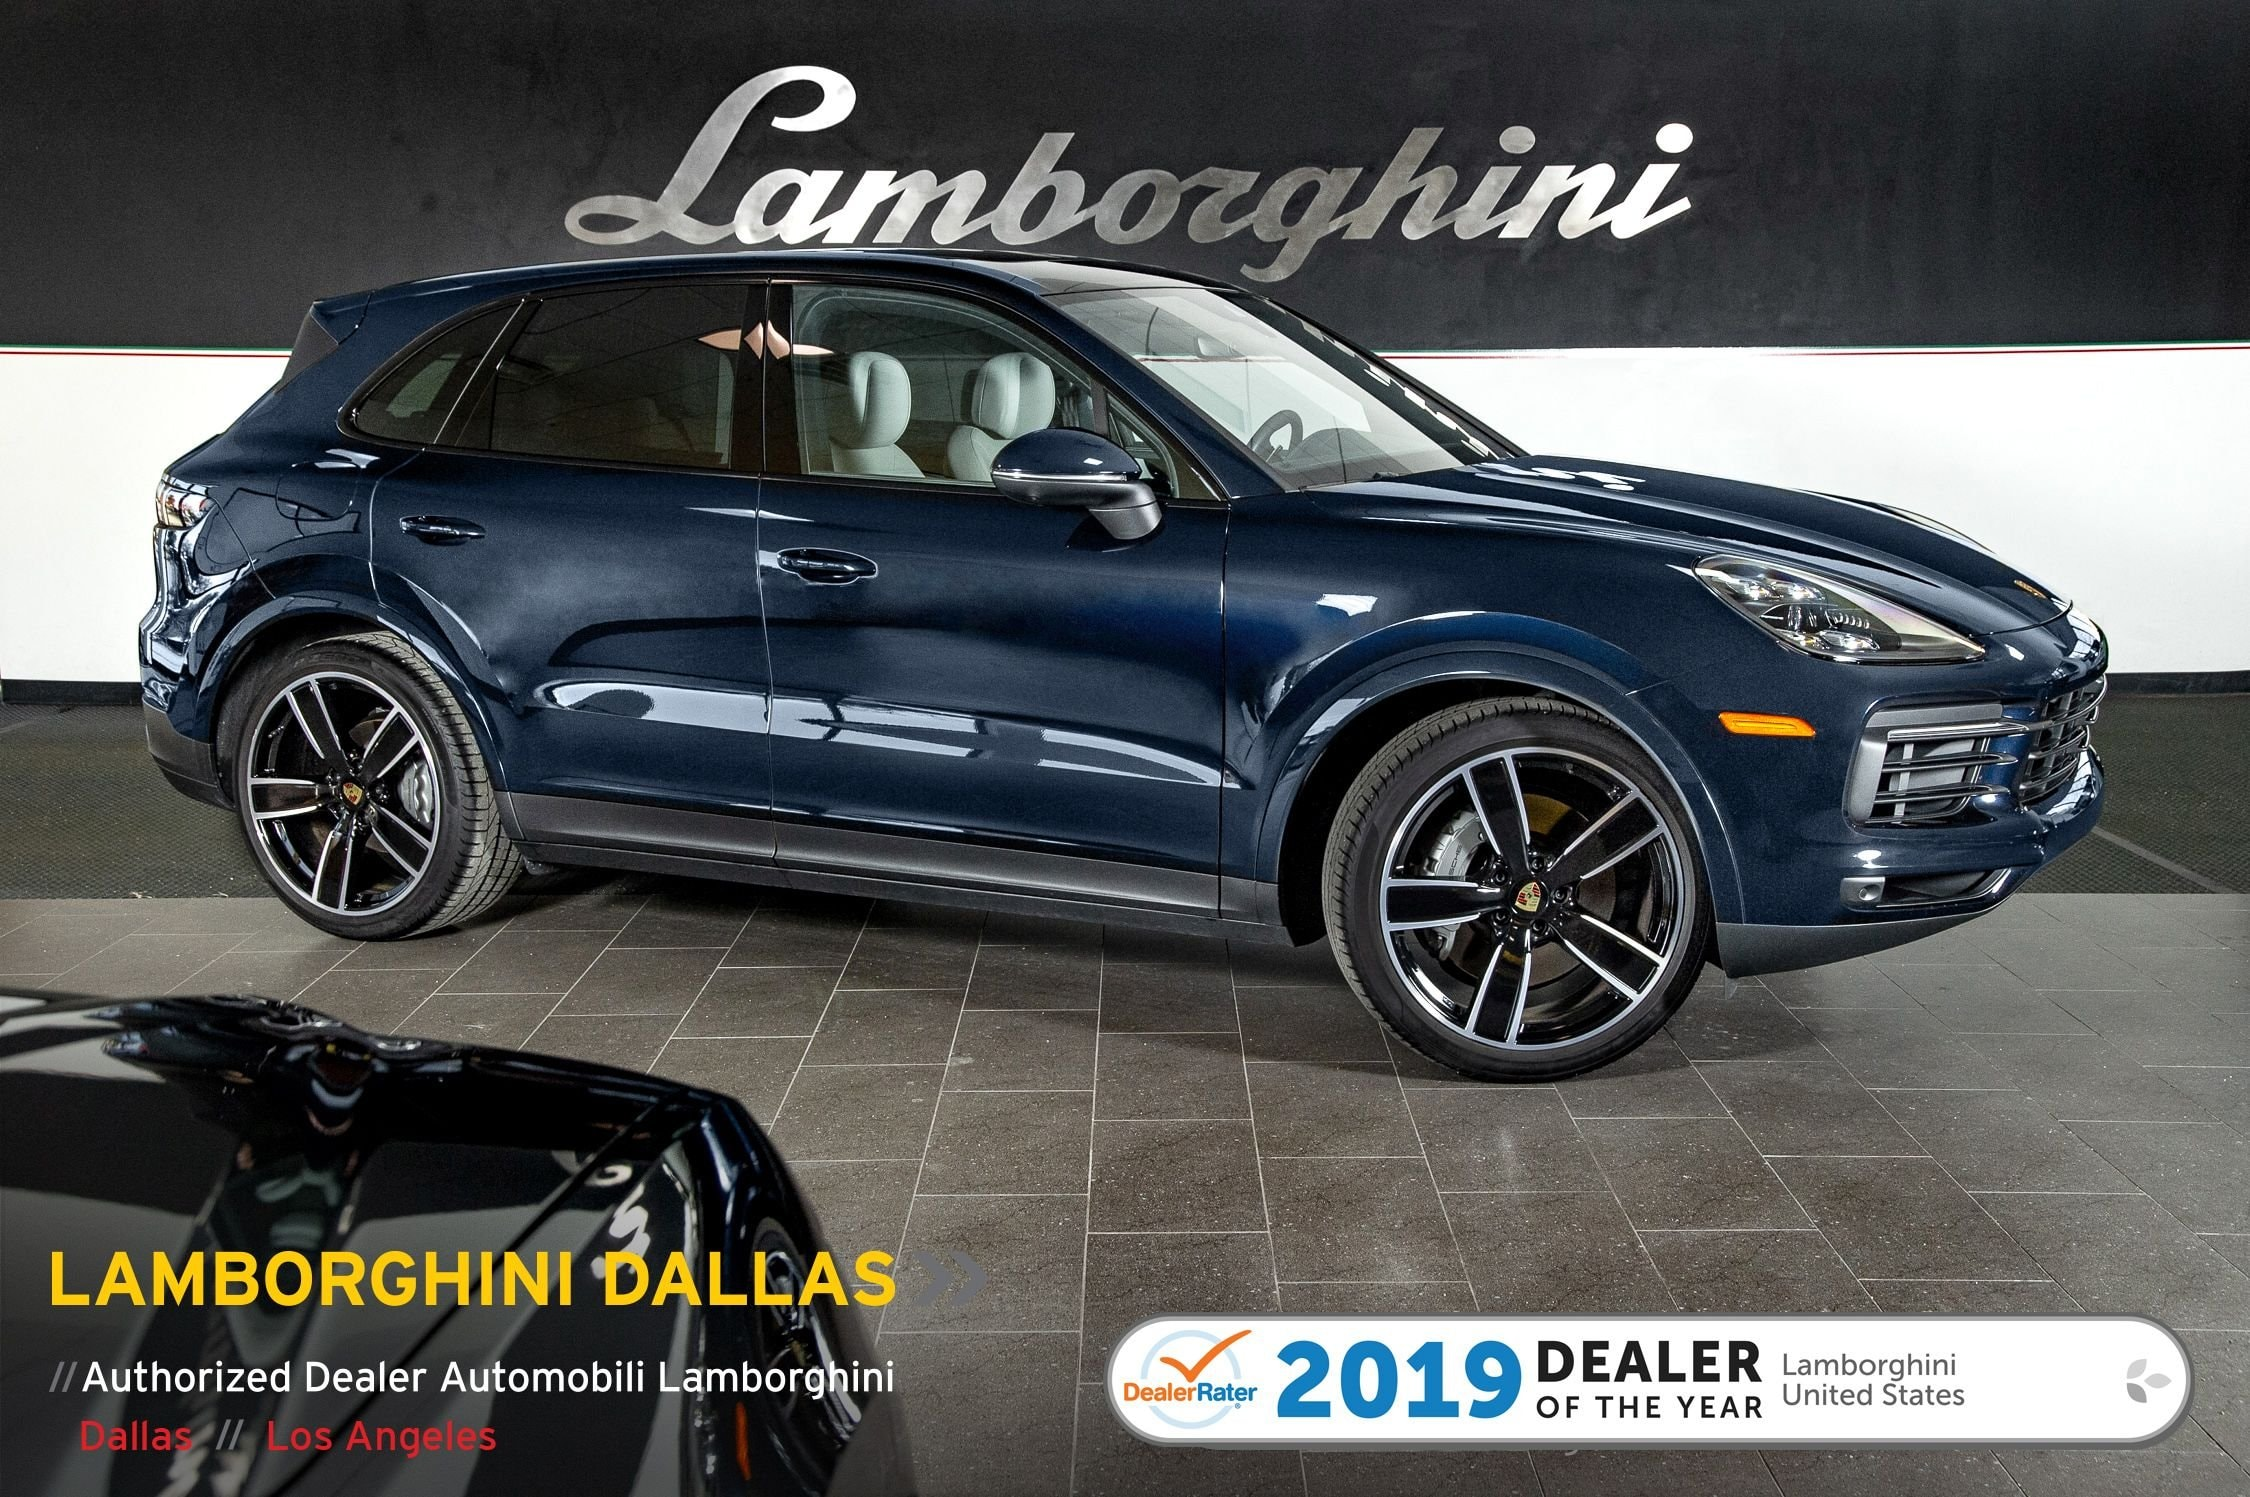 Used 2019 Porsche Cayenne S For Sale Richardson Tx Stock 20l0274b Vin Wp1ab2ay6kda61491